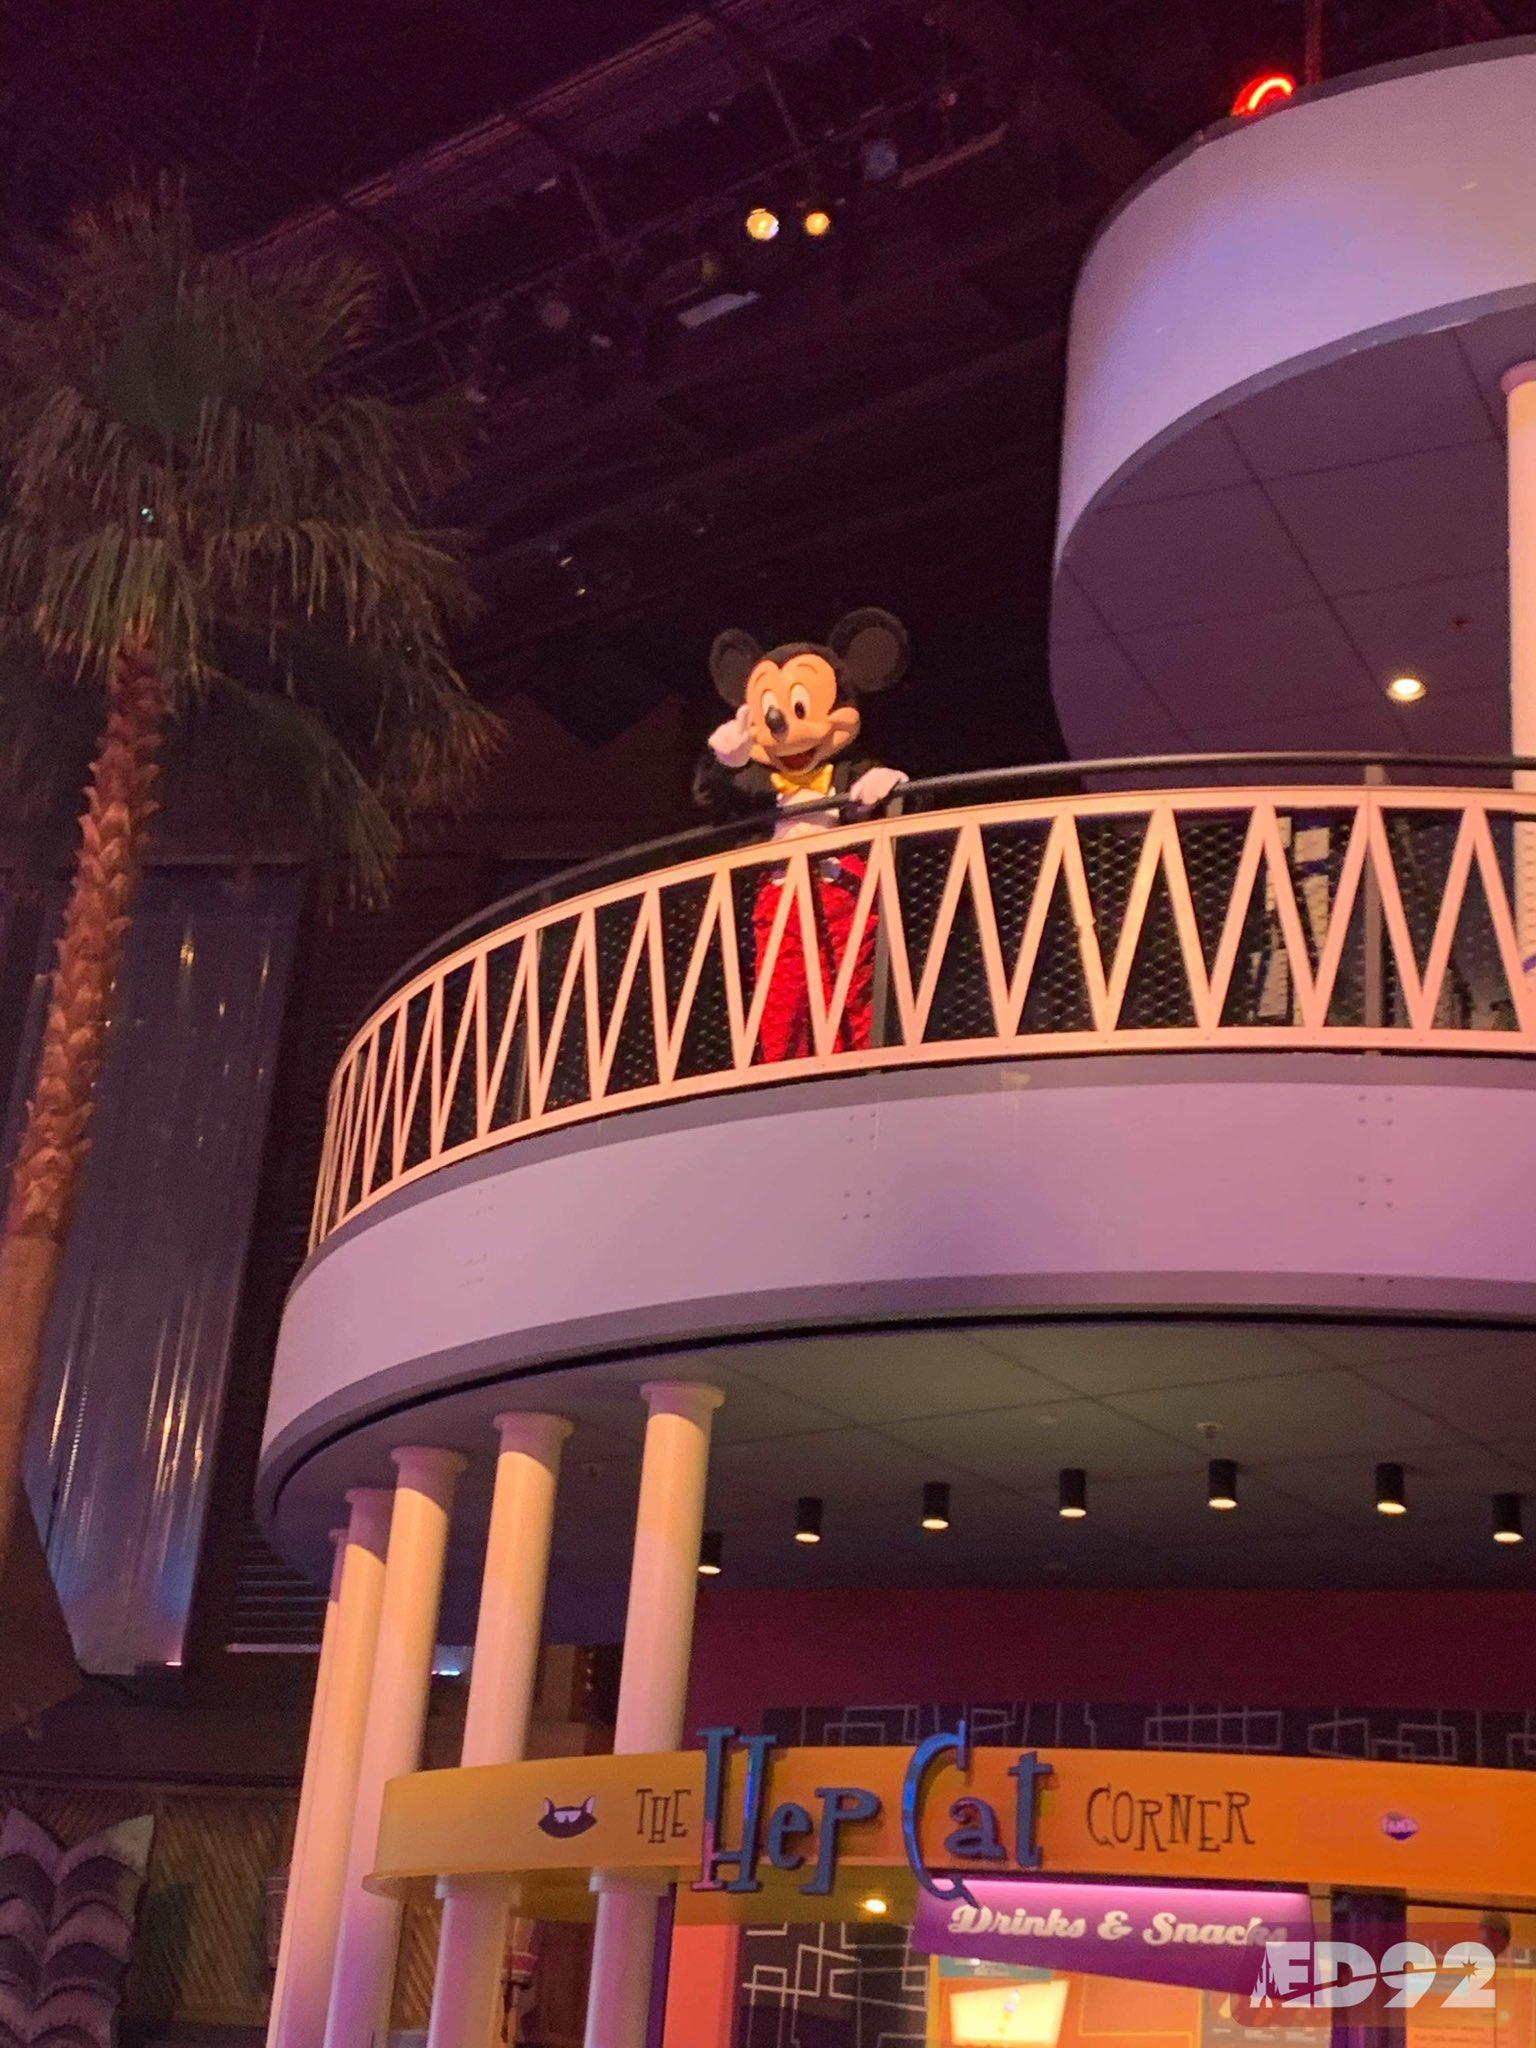 Disneyland Paris ouvert pendant la COVID-19 (juillet-octobre 2020)  - Page 2 EcoYi7XWAAANZMJ?format=jpg&name=large